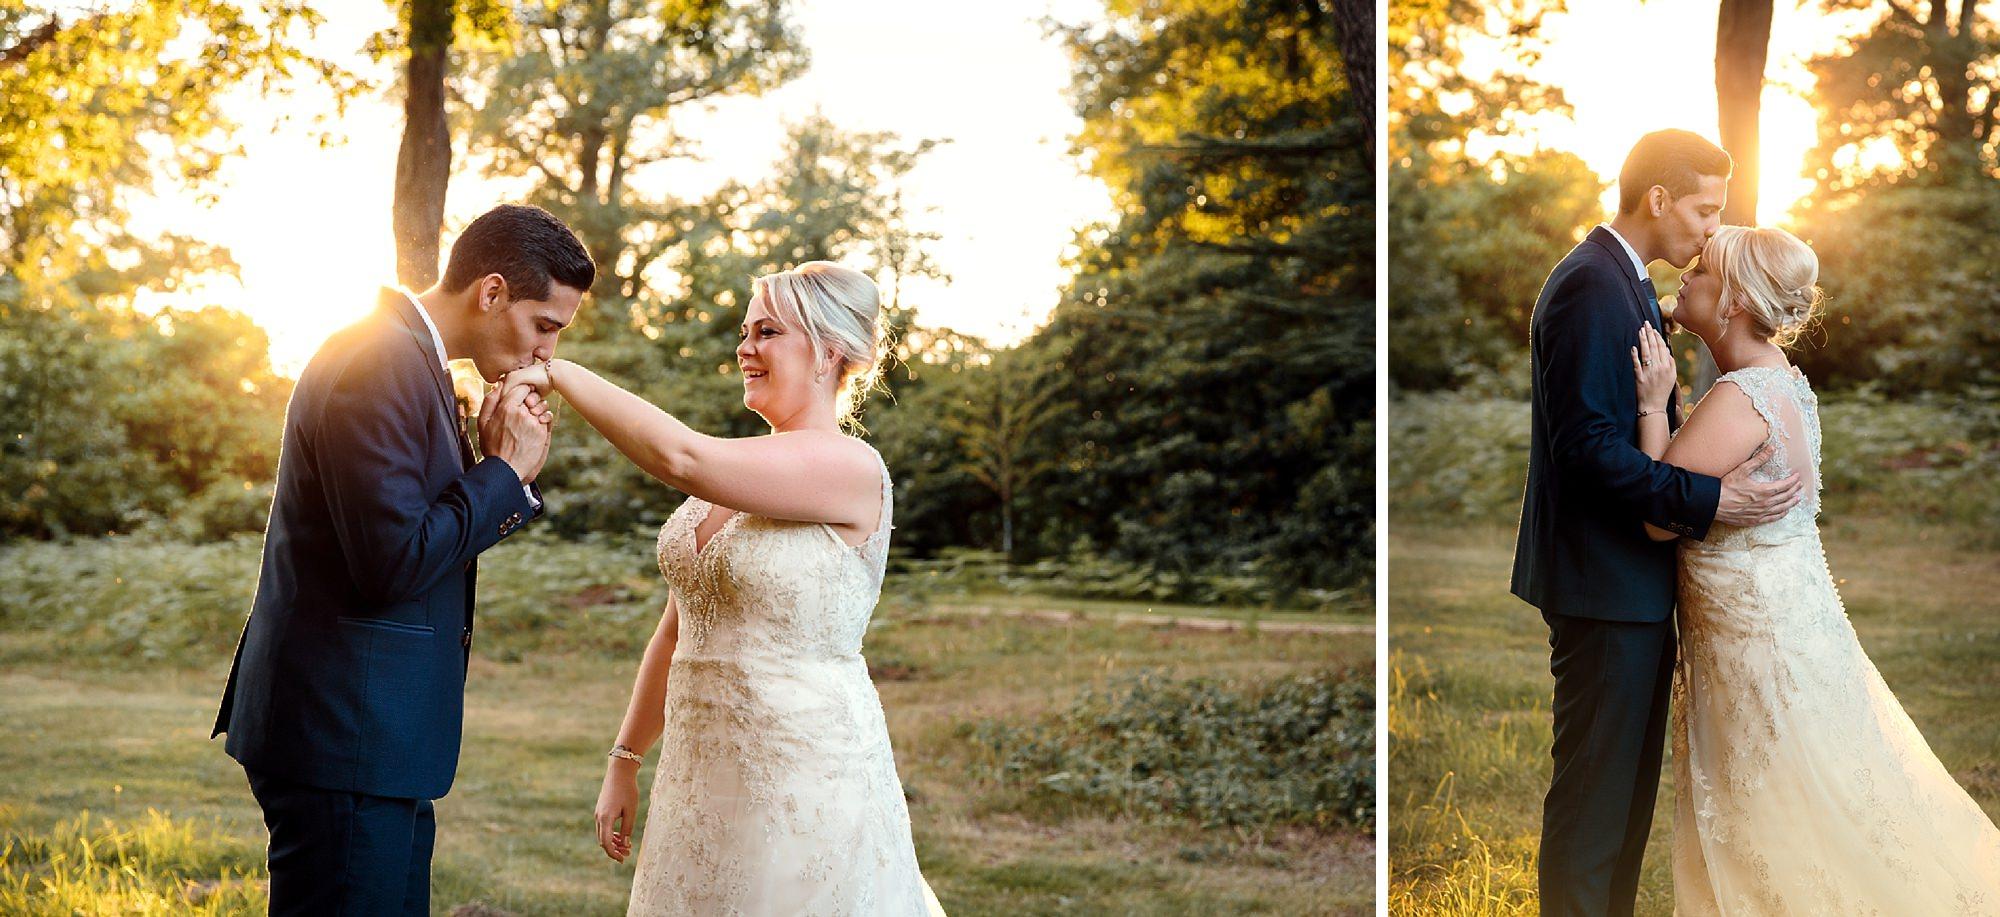 Bignor Park wedding photography sunset portrait of bride and groom